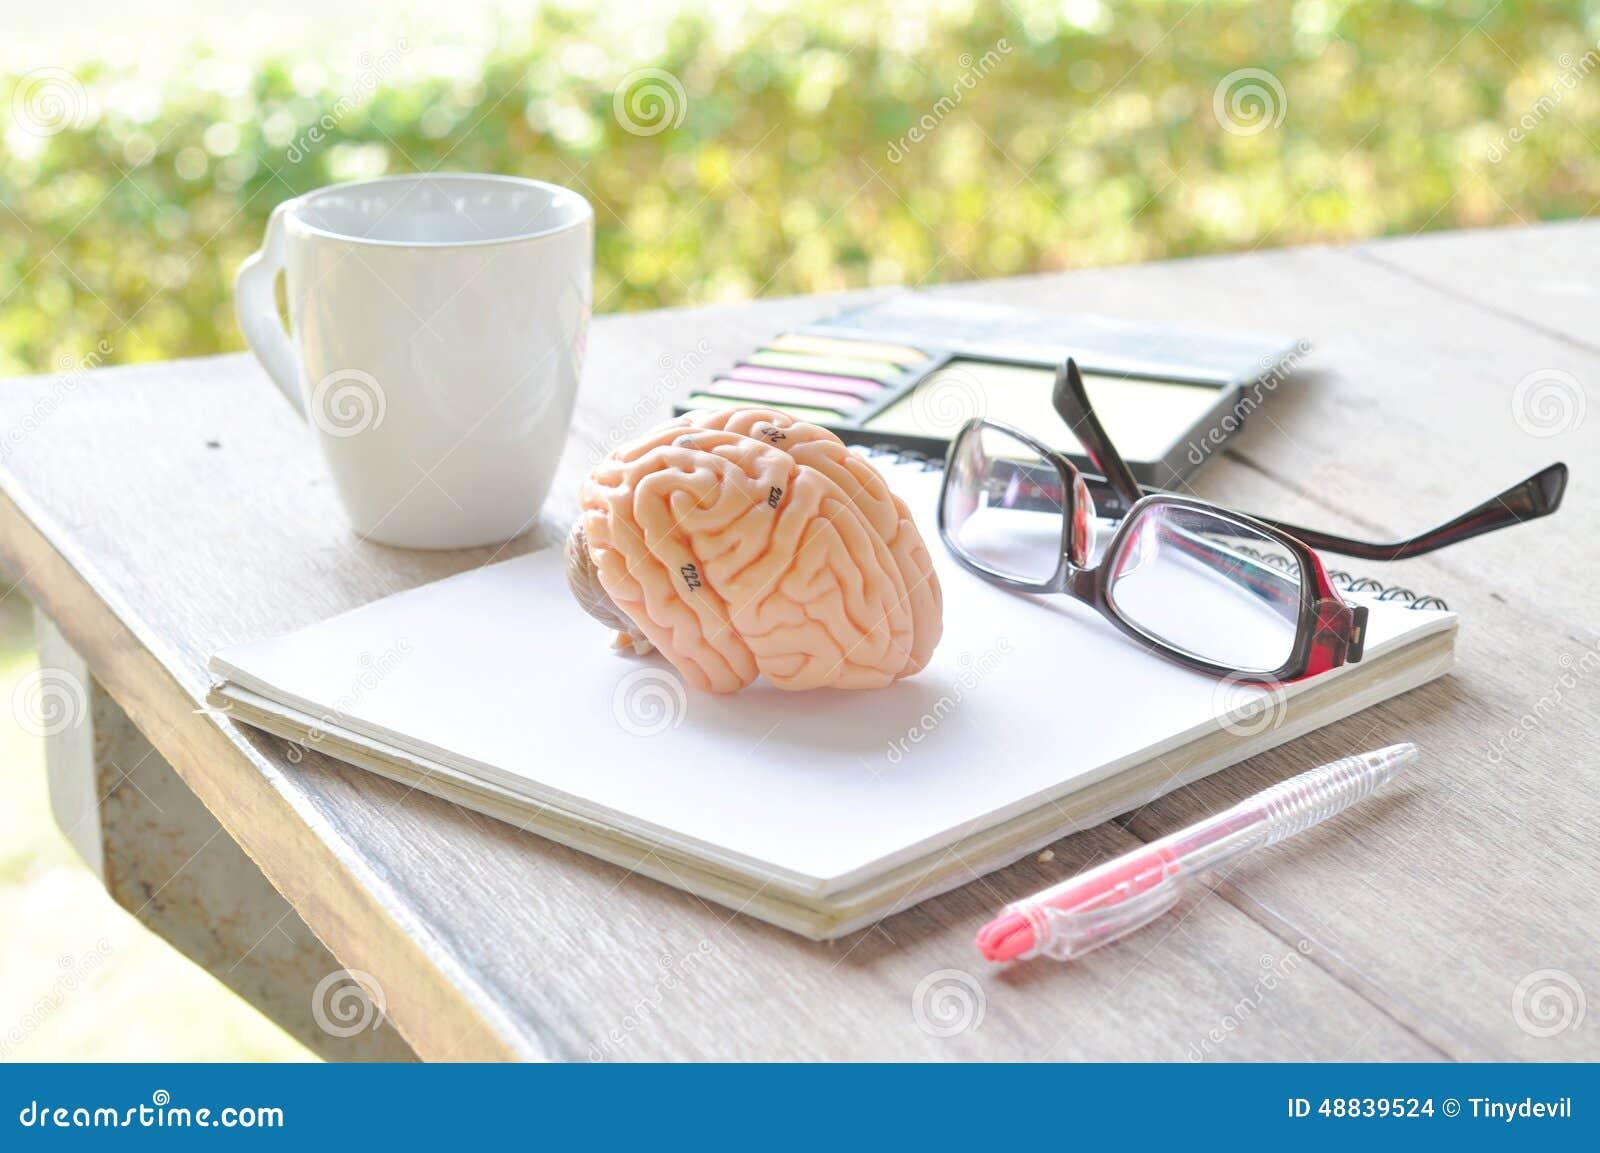 Human Brain Model Stock Photo Image Of Organ Brain 48839524